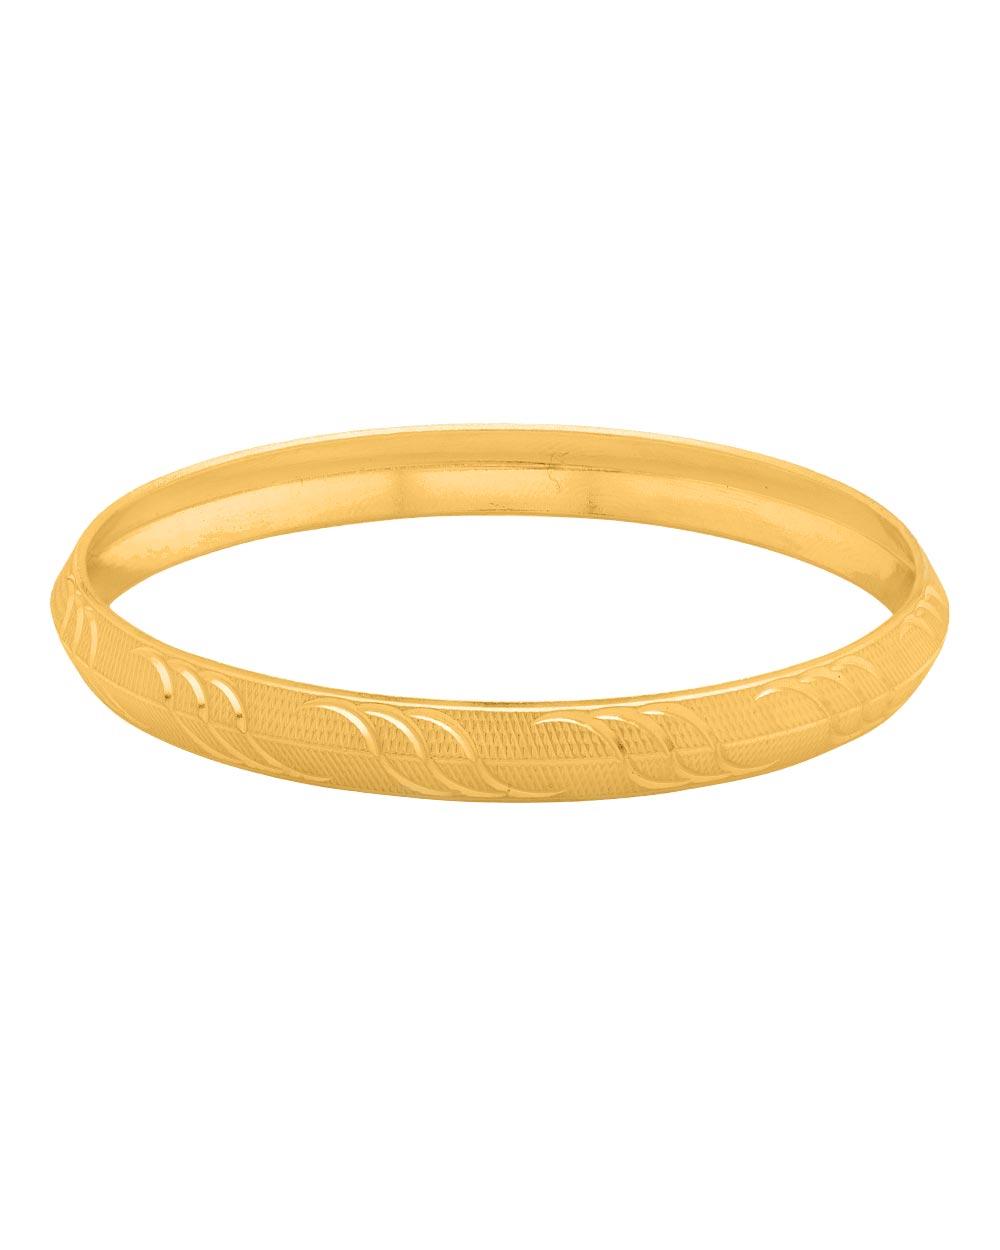 Buy Stylish Gold Plated Kada For Men Online India | Voylla